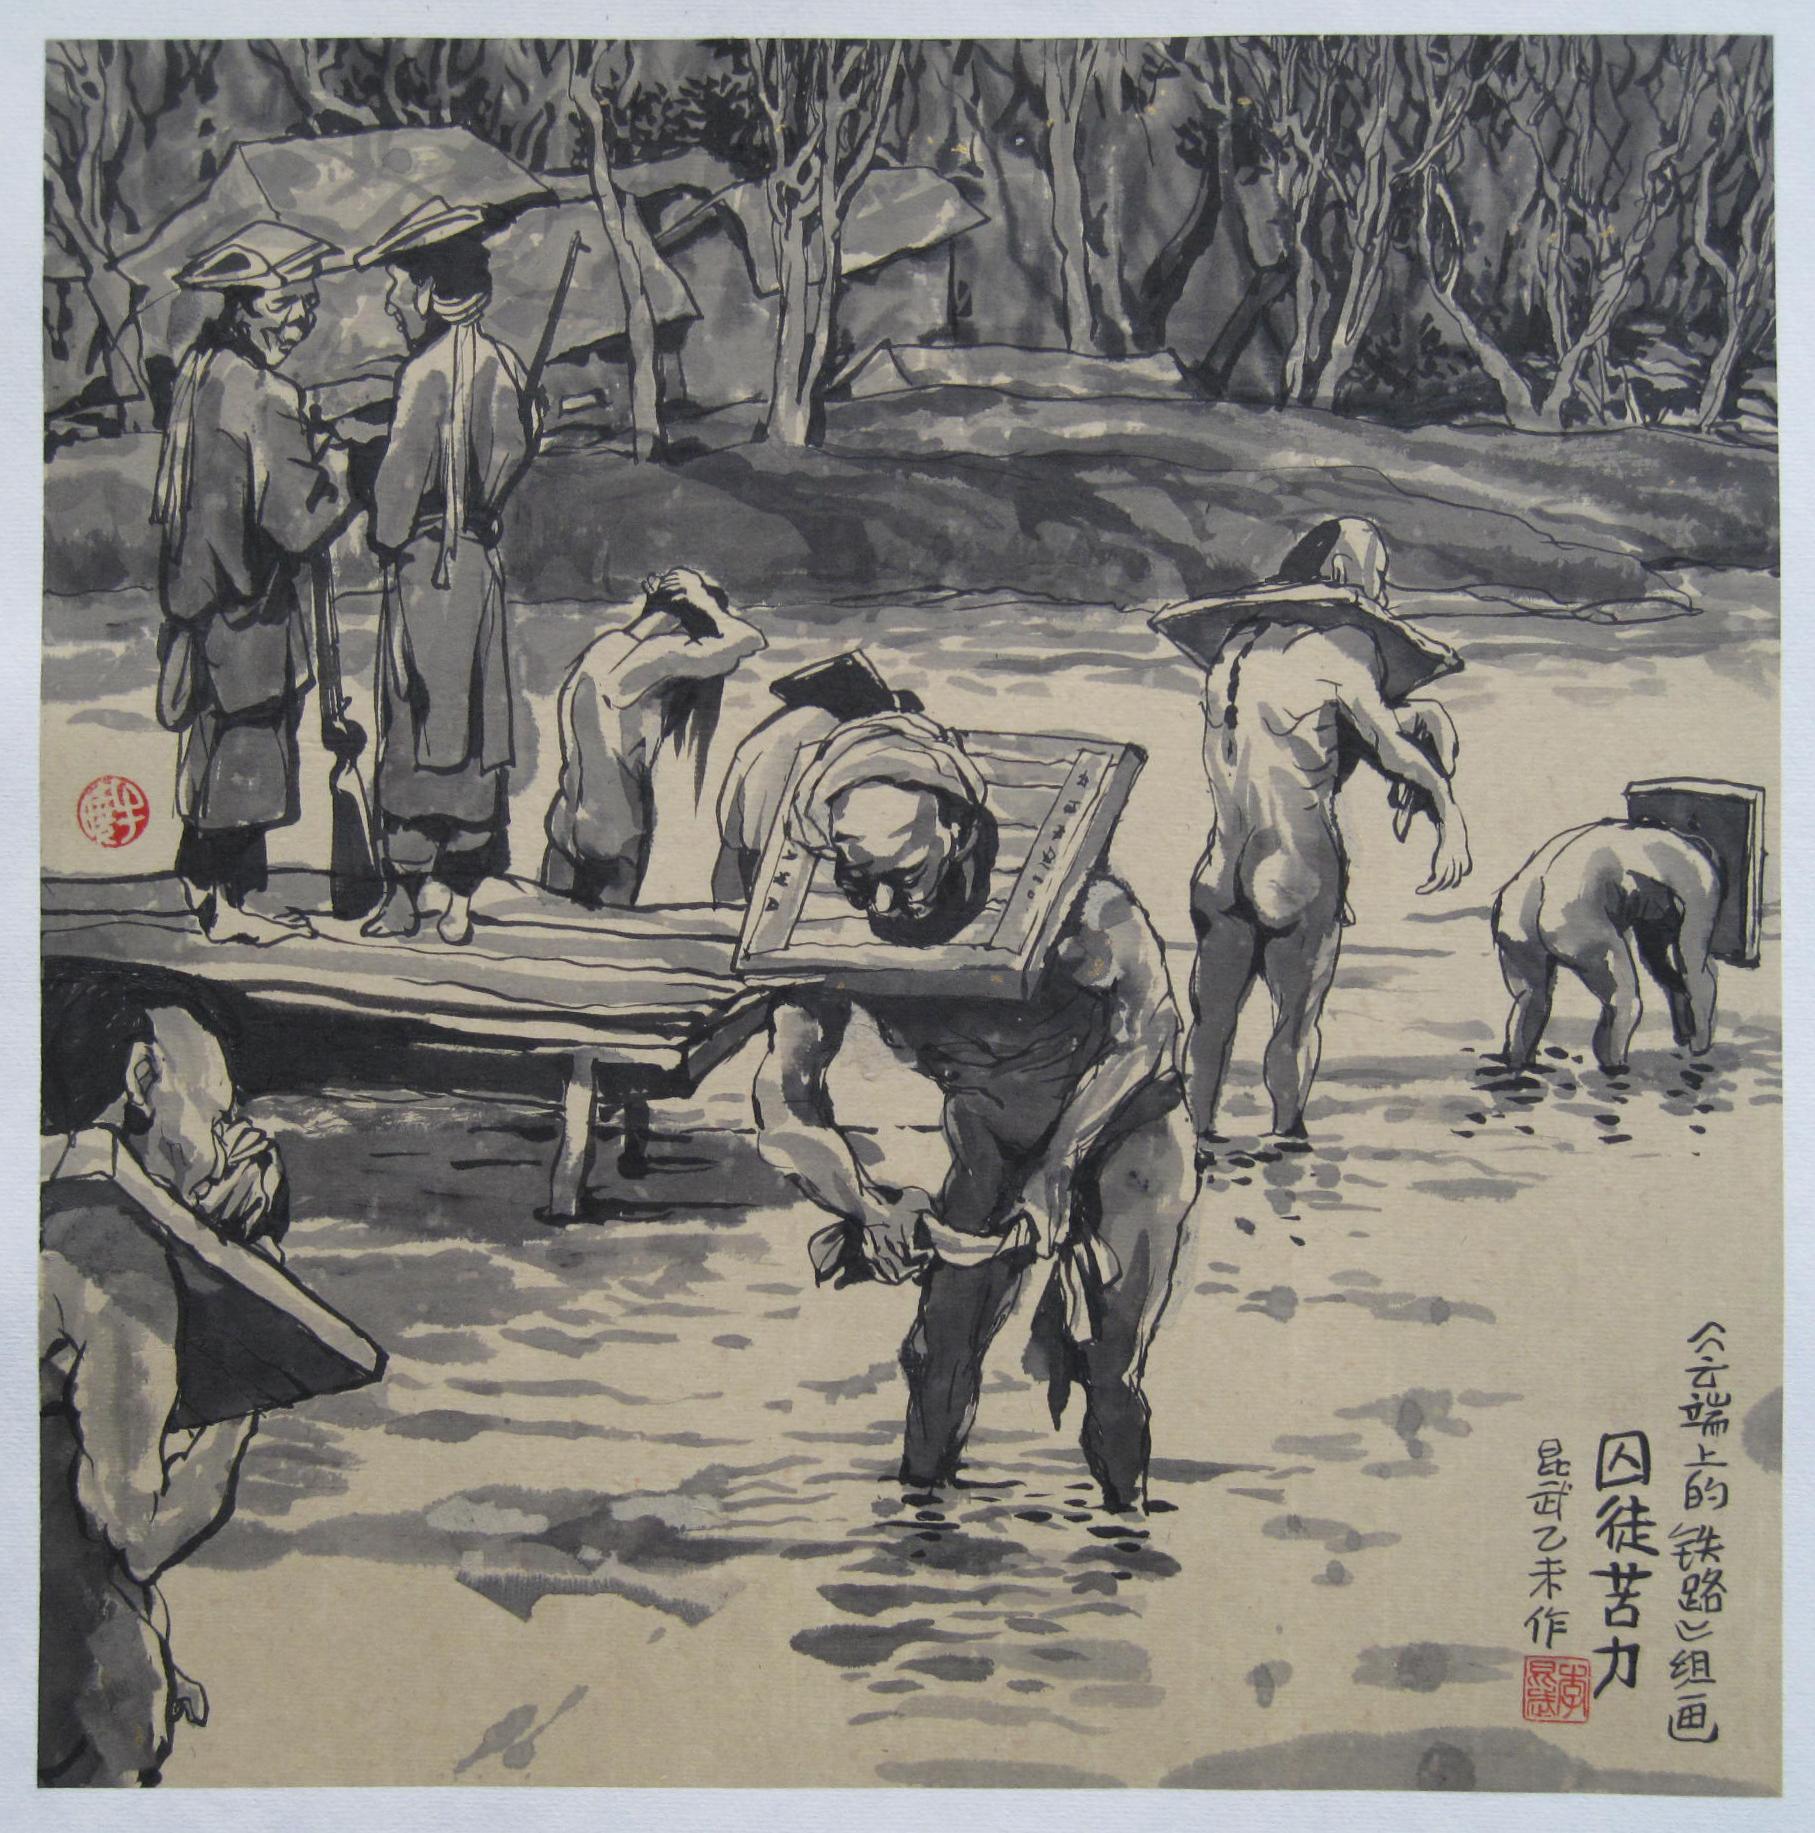 Coolies prisonniers portant une cangue 囚徒苦力 © Li Kunwu, 2015, 35 X 35 cm